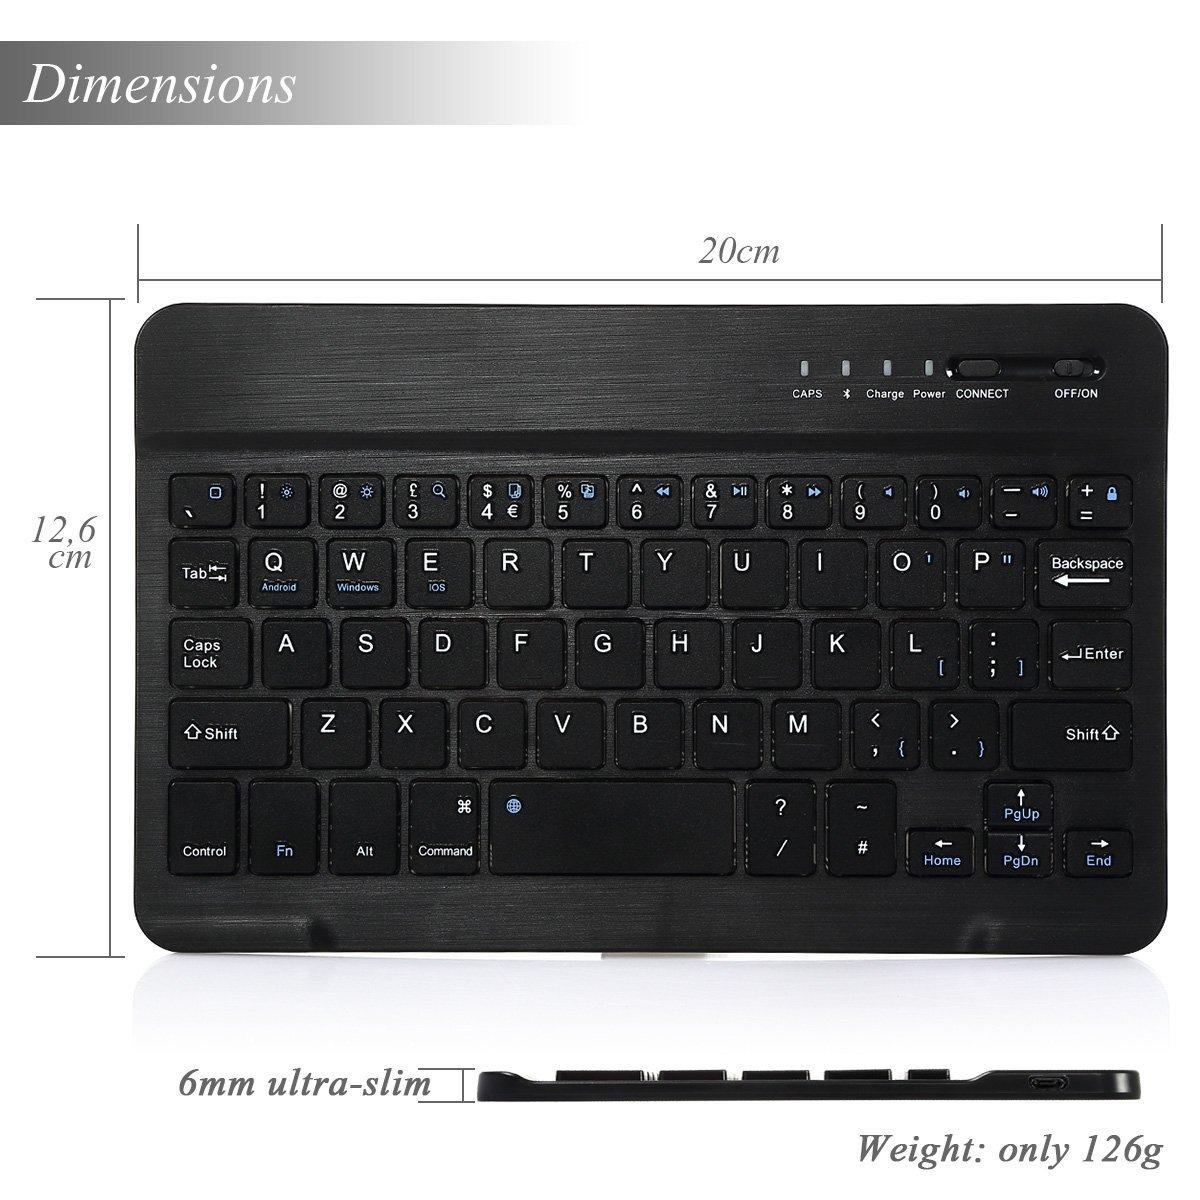 CoastaCloud 7-inch Ultra Slim Portable Wireless Bluetooth Keyboard for iPad 2/3/4, iPad Mini 4/3/2/1, Galaxy Tab and other iOS, Android, Windows Devices (Black) by CoastaCloud (Image #4)